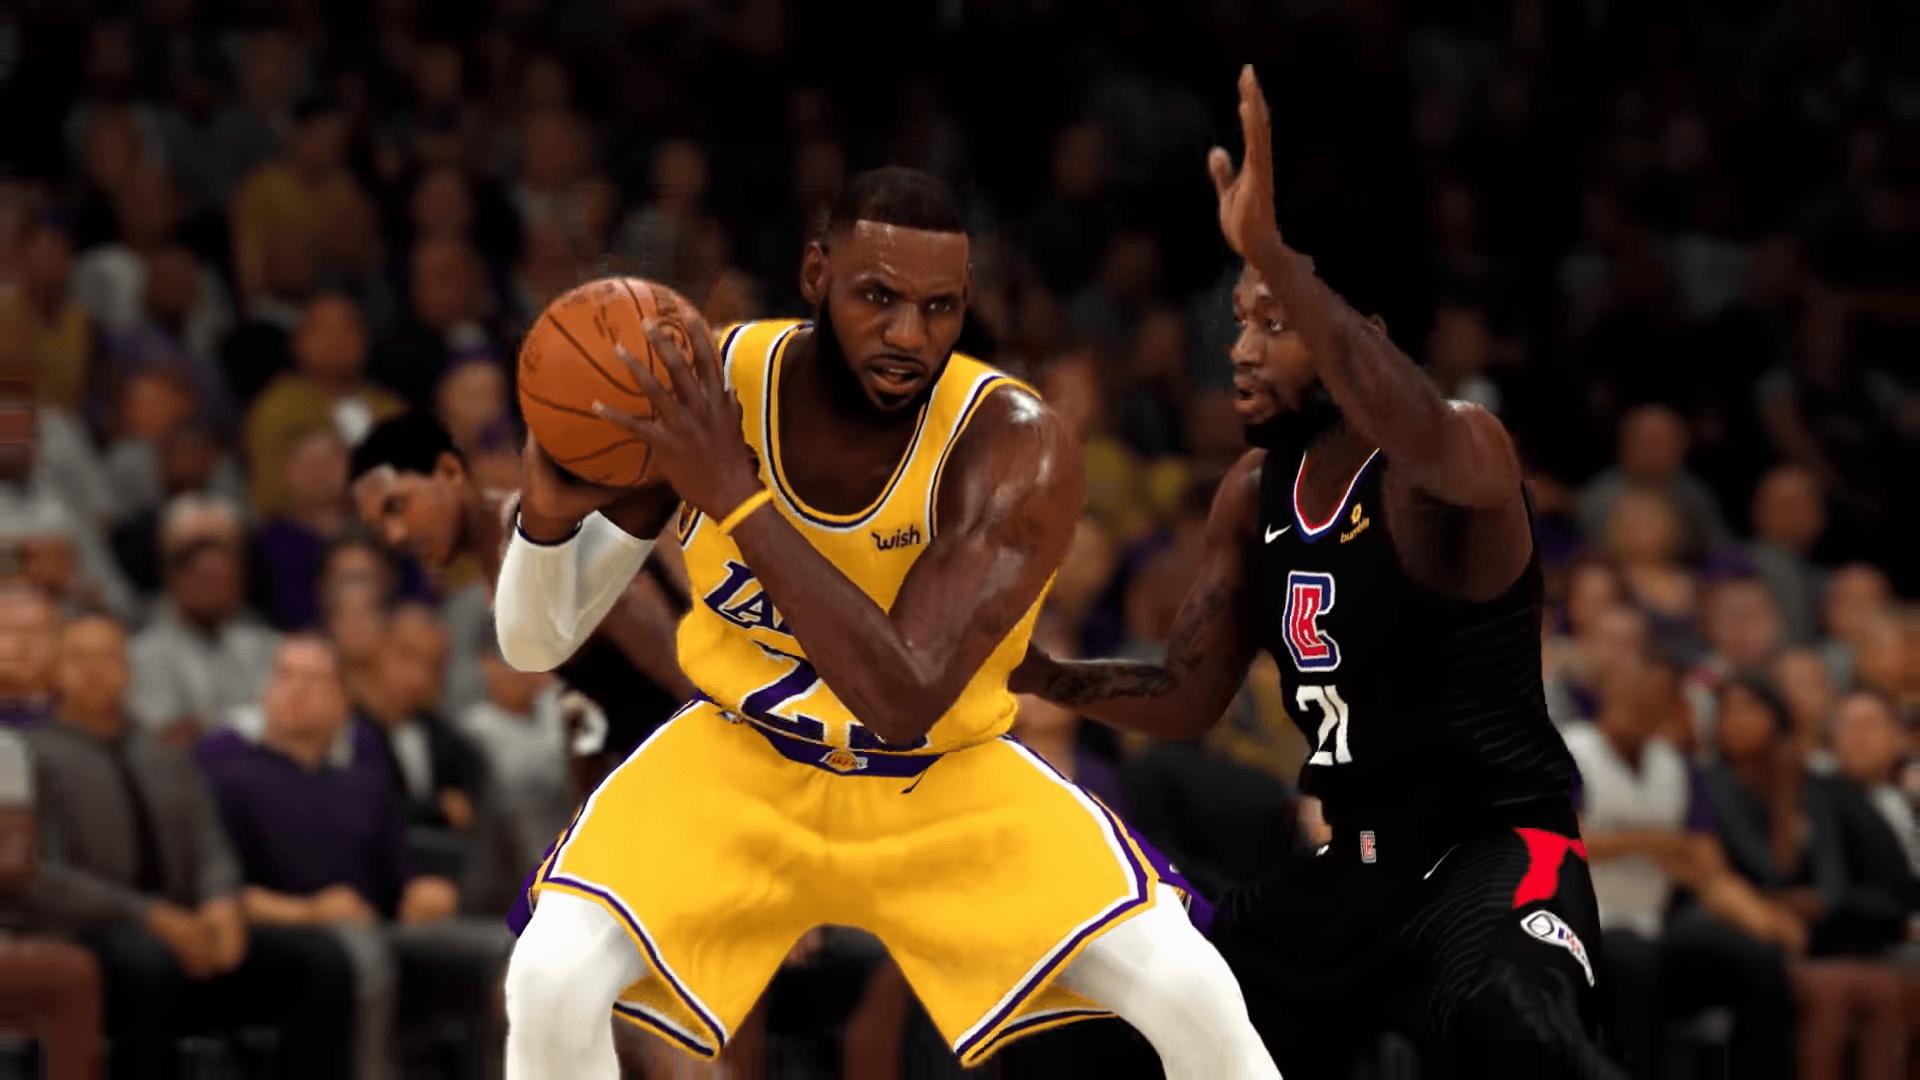 NBA 2k21 Wallpapers - Top Free NBA 2k21 Backgrounds ...